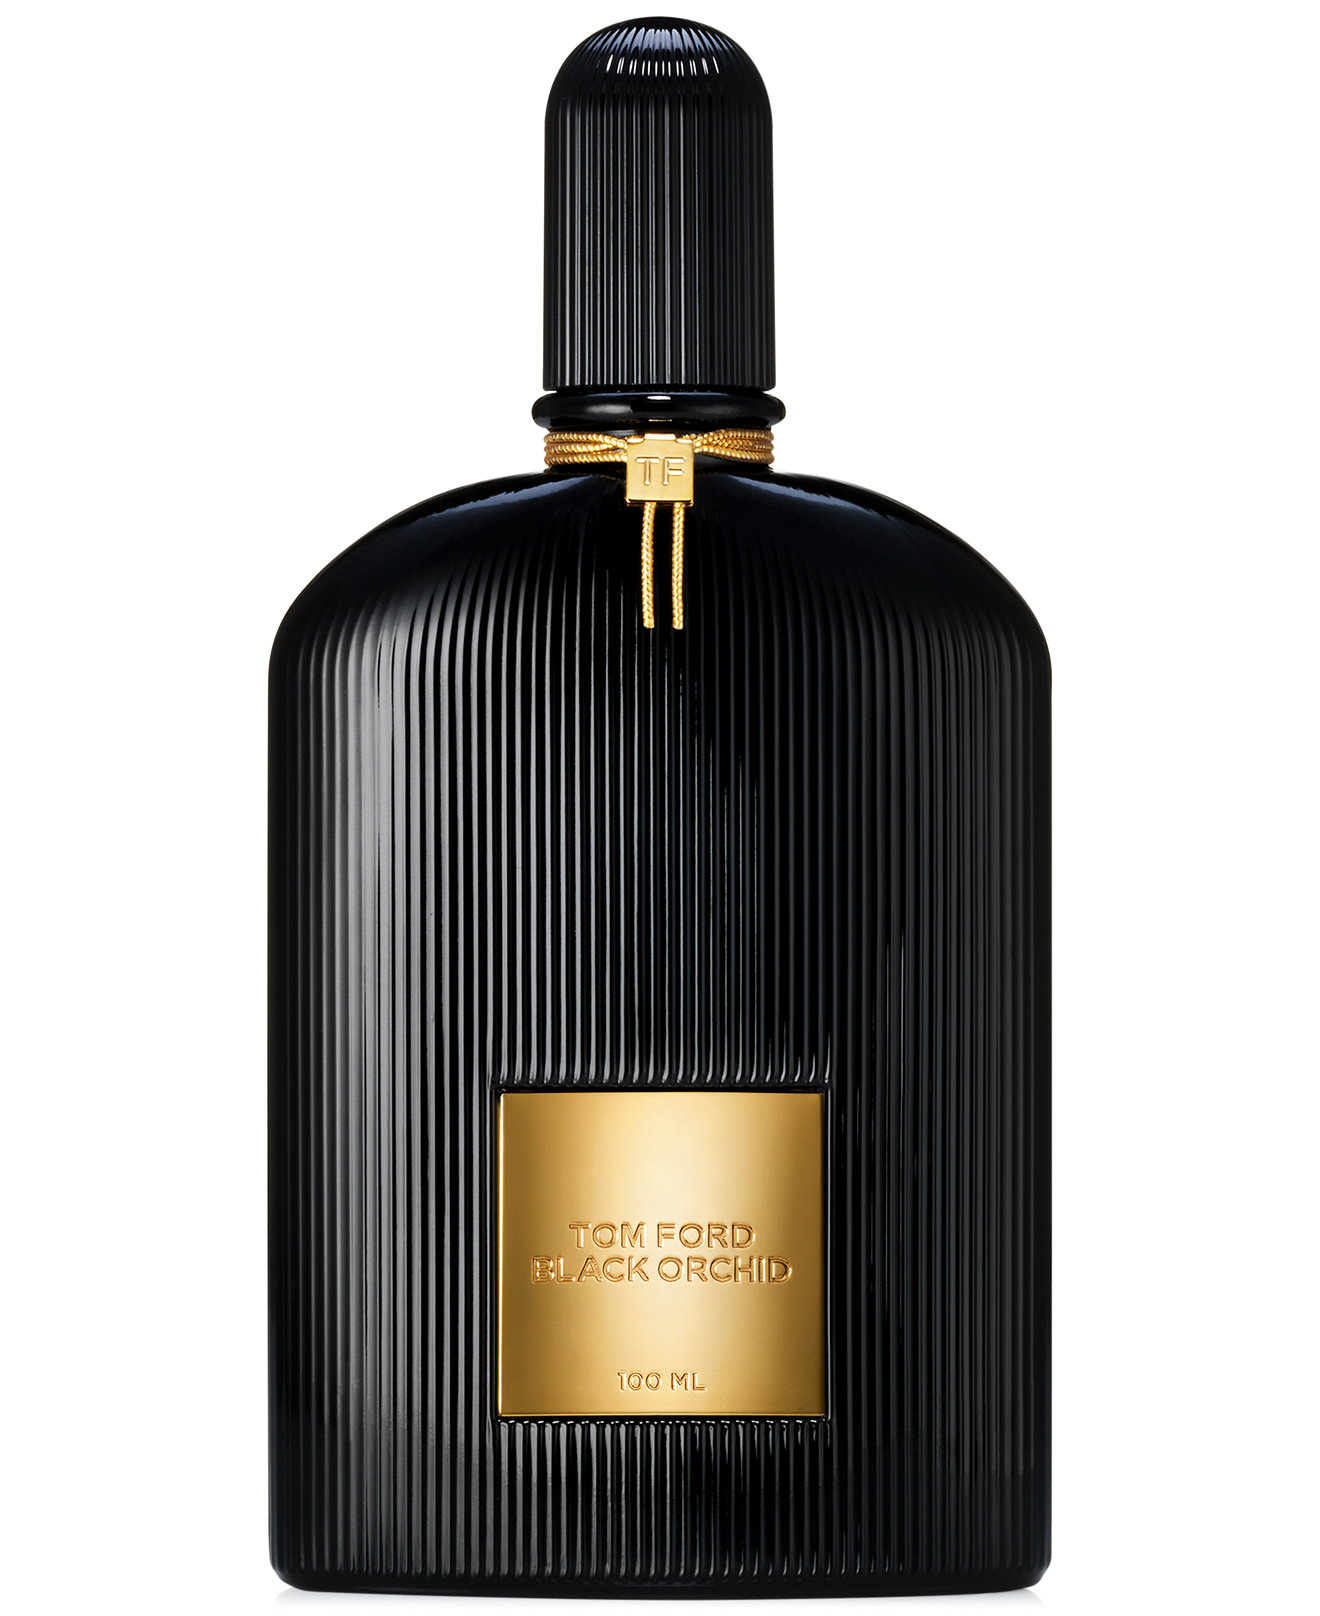 Tom Ford Black Orchid Eau De Parfum Fragrance Collection All Brands Beauty Y S